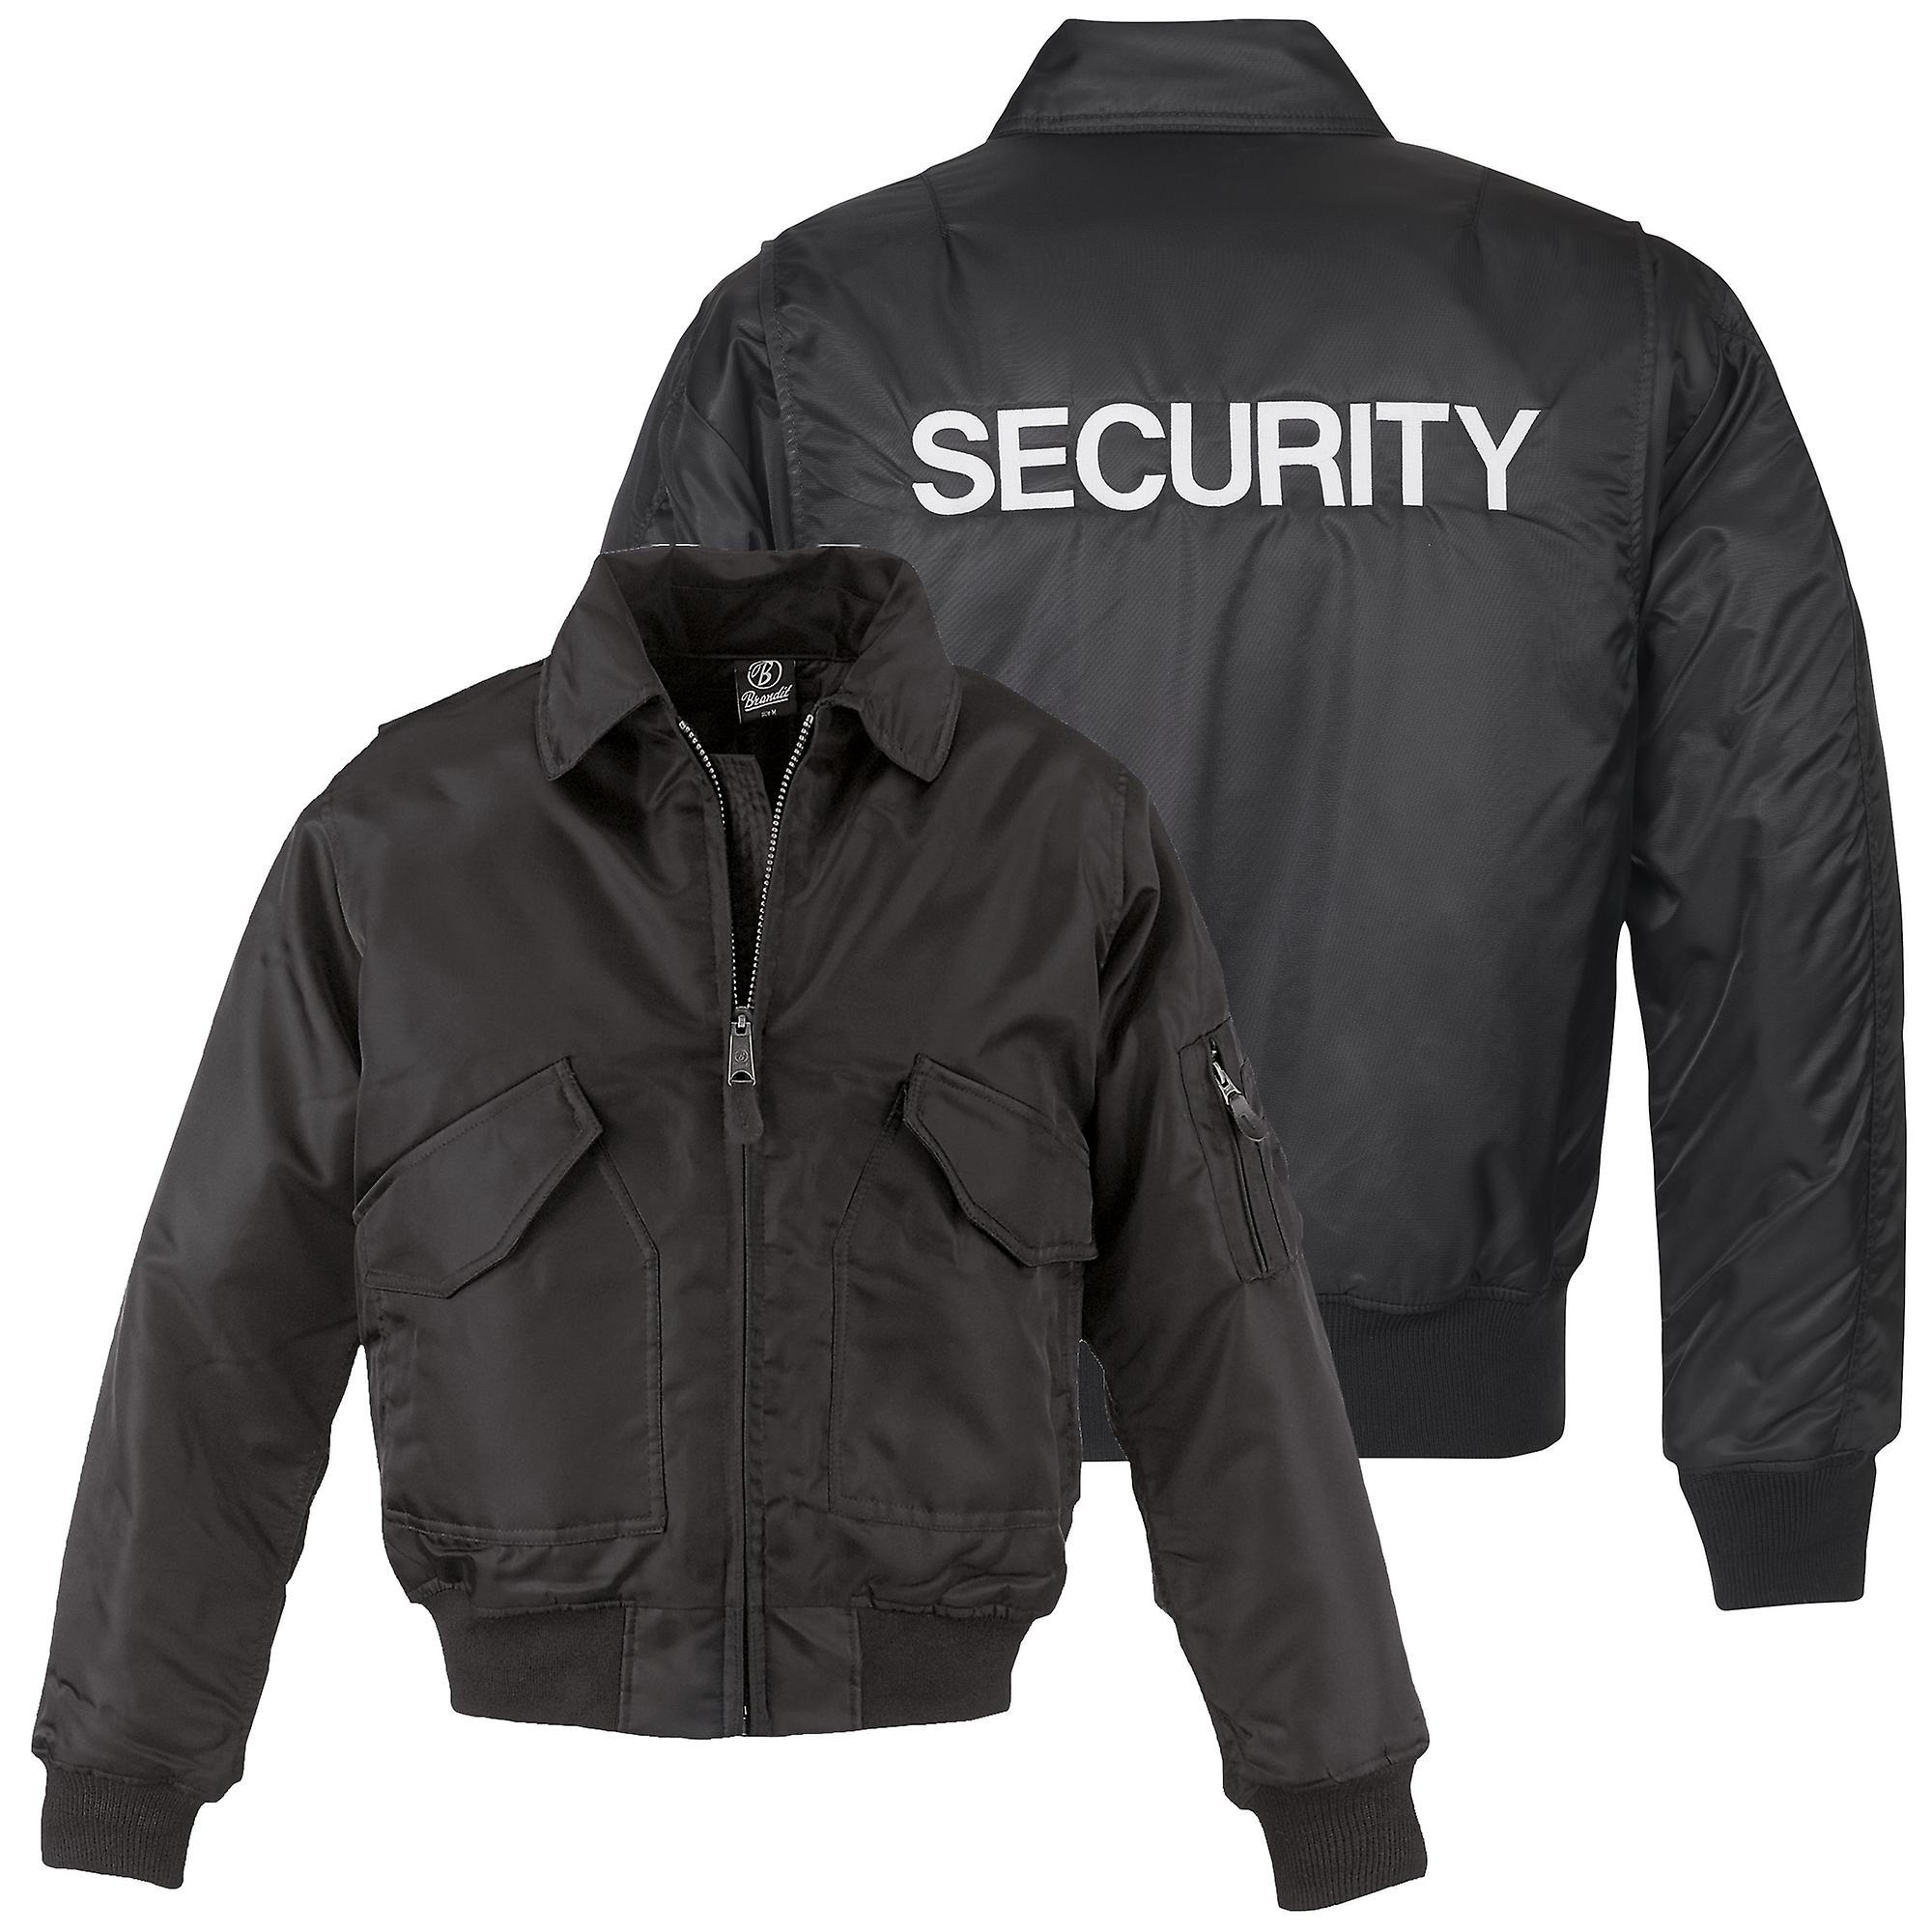 Brandit mens CWU Brandit seguridad mens Cazadora 7yfYgb6v